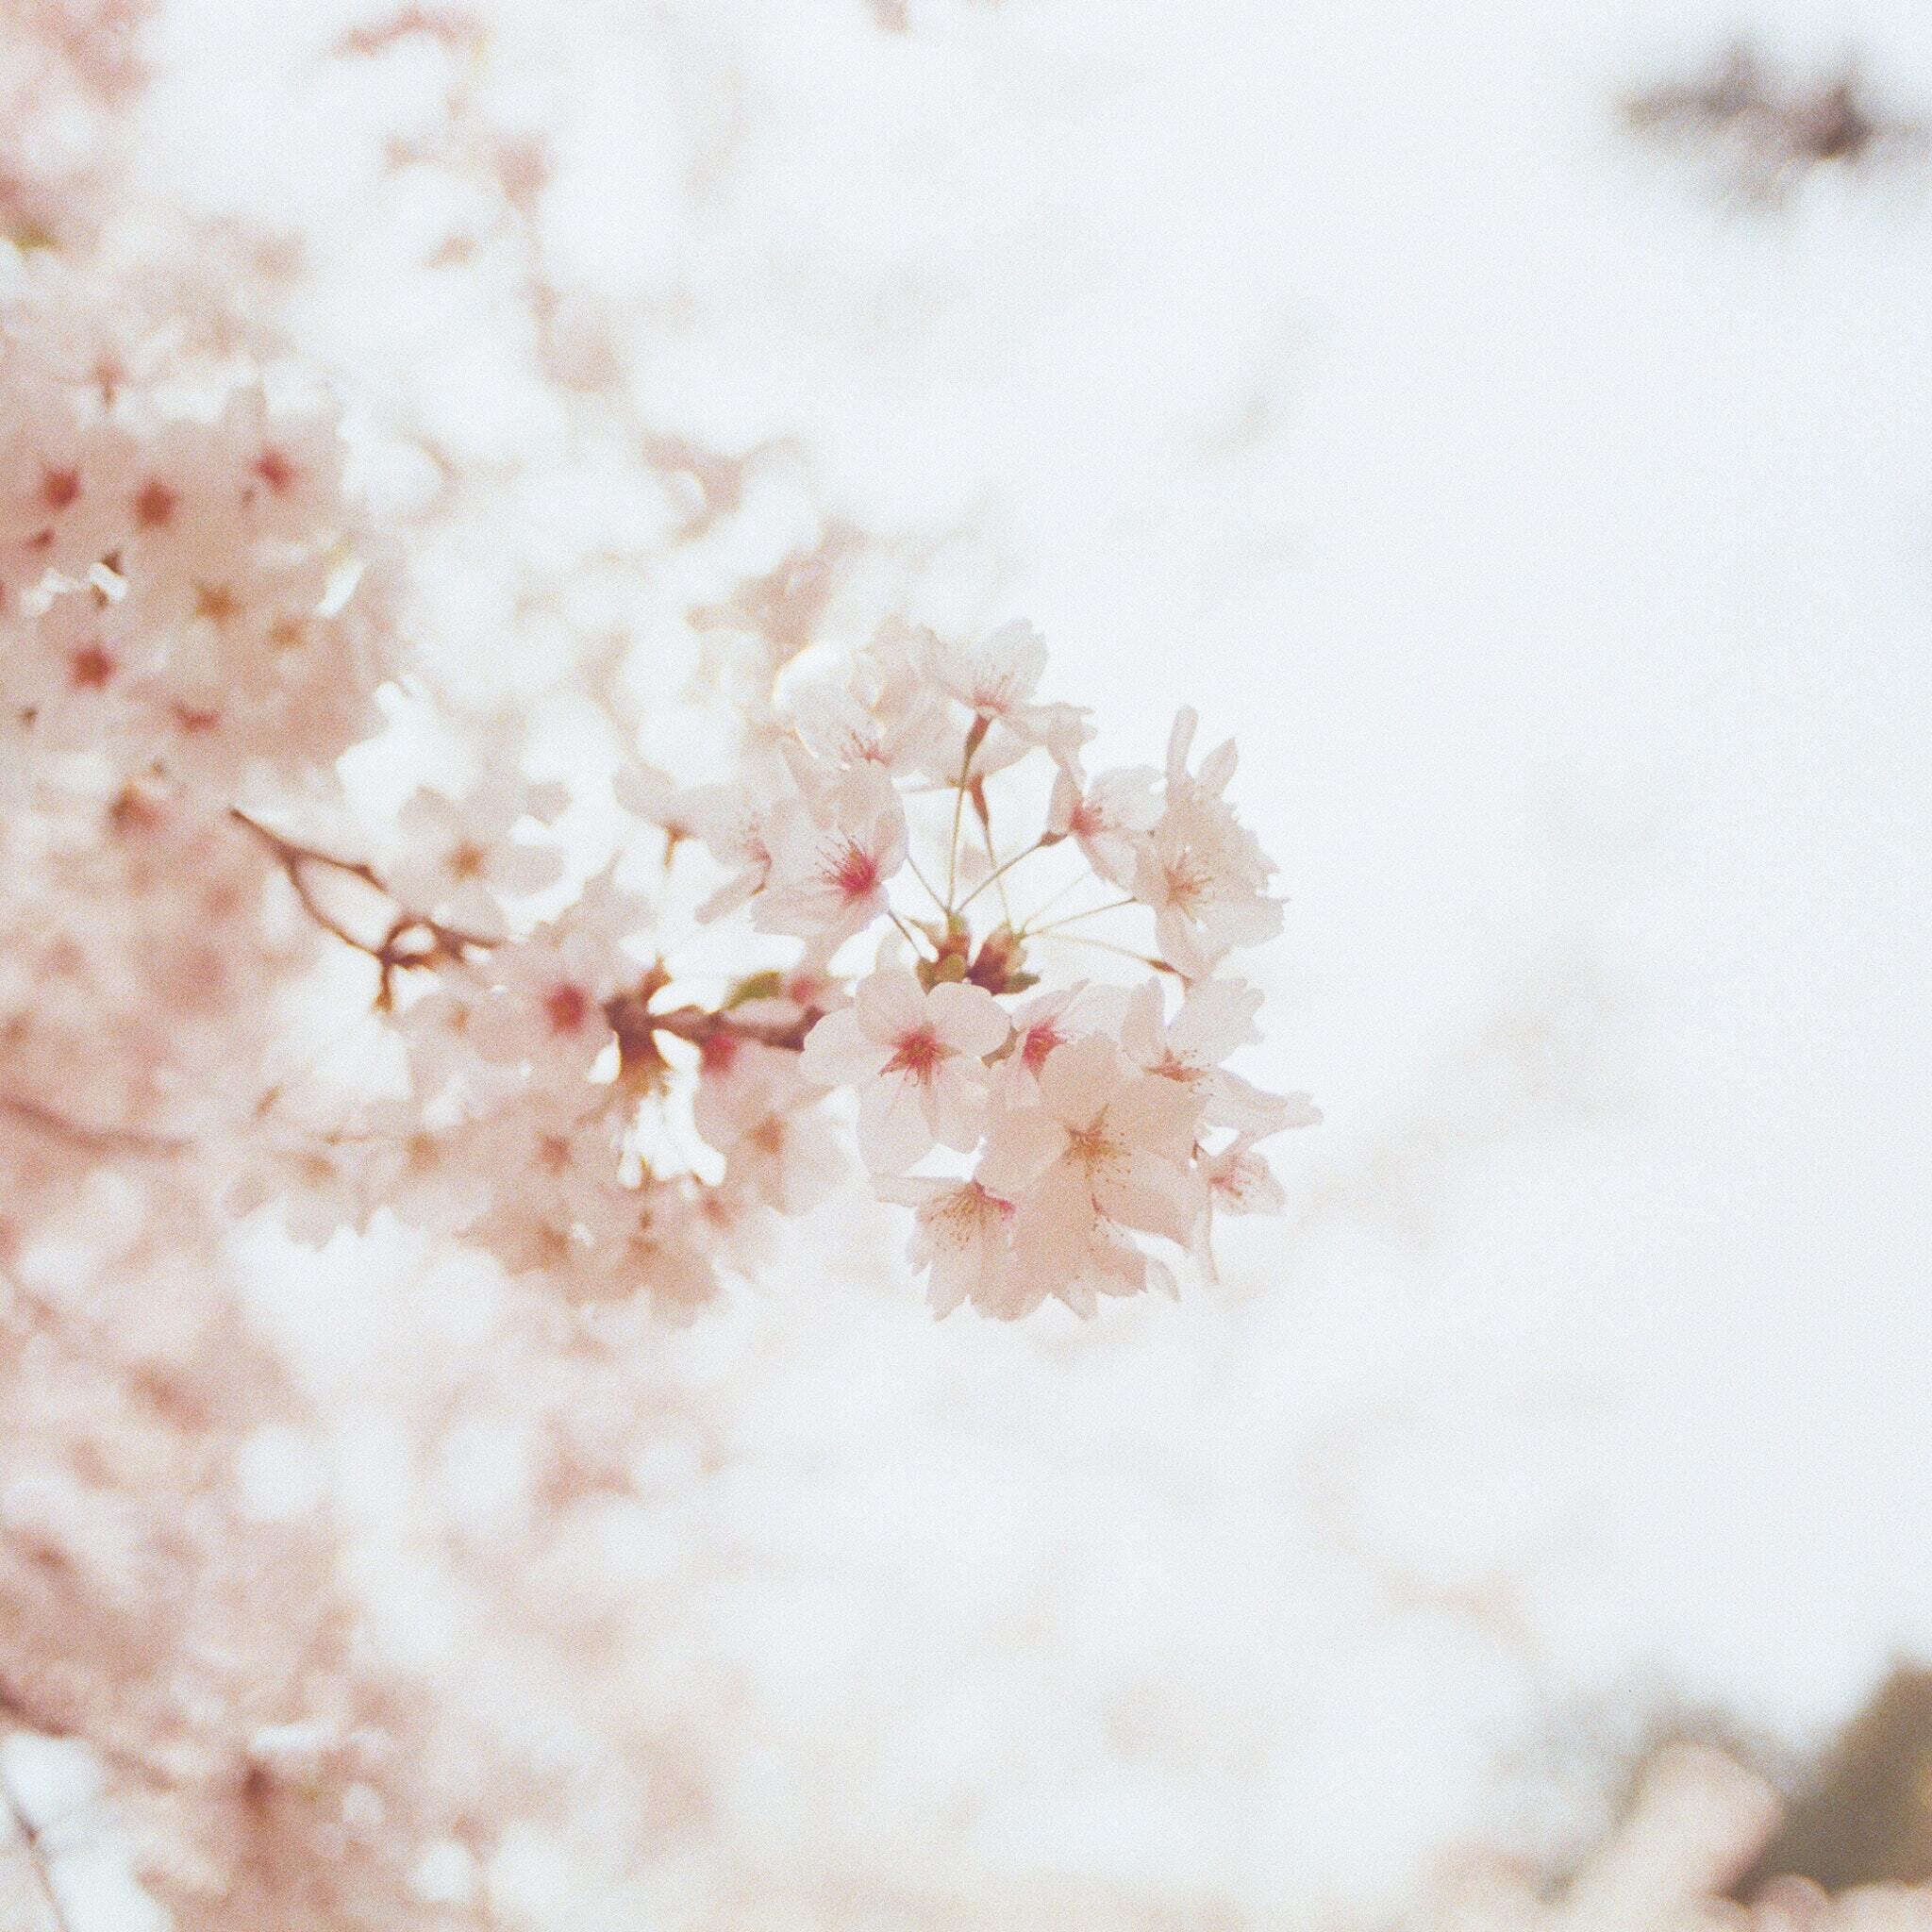 cherry-blossoms-flowers-2e.jpg